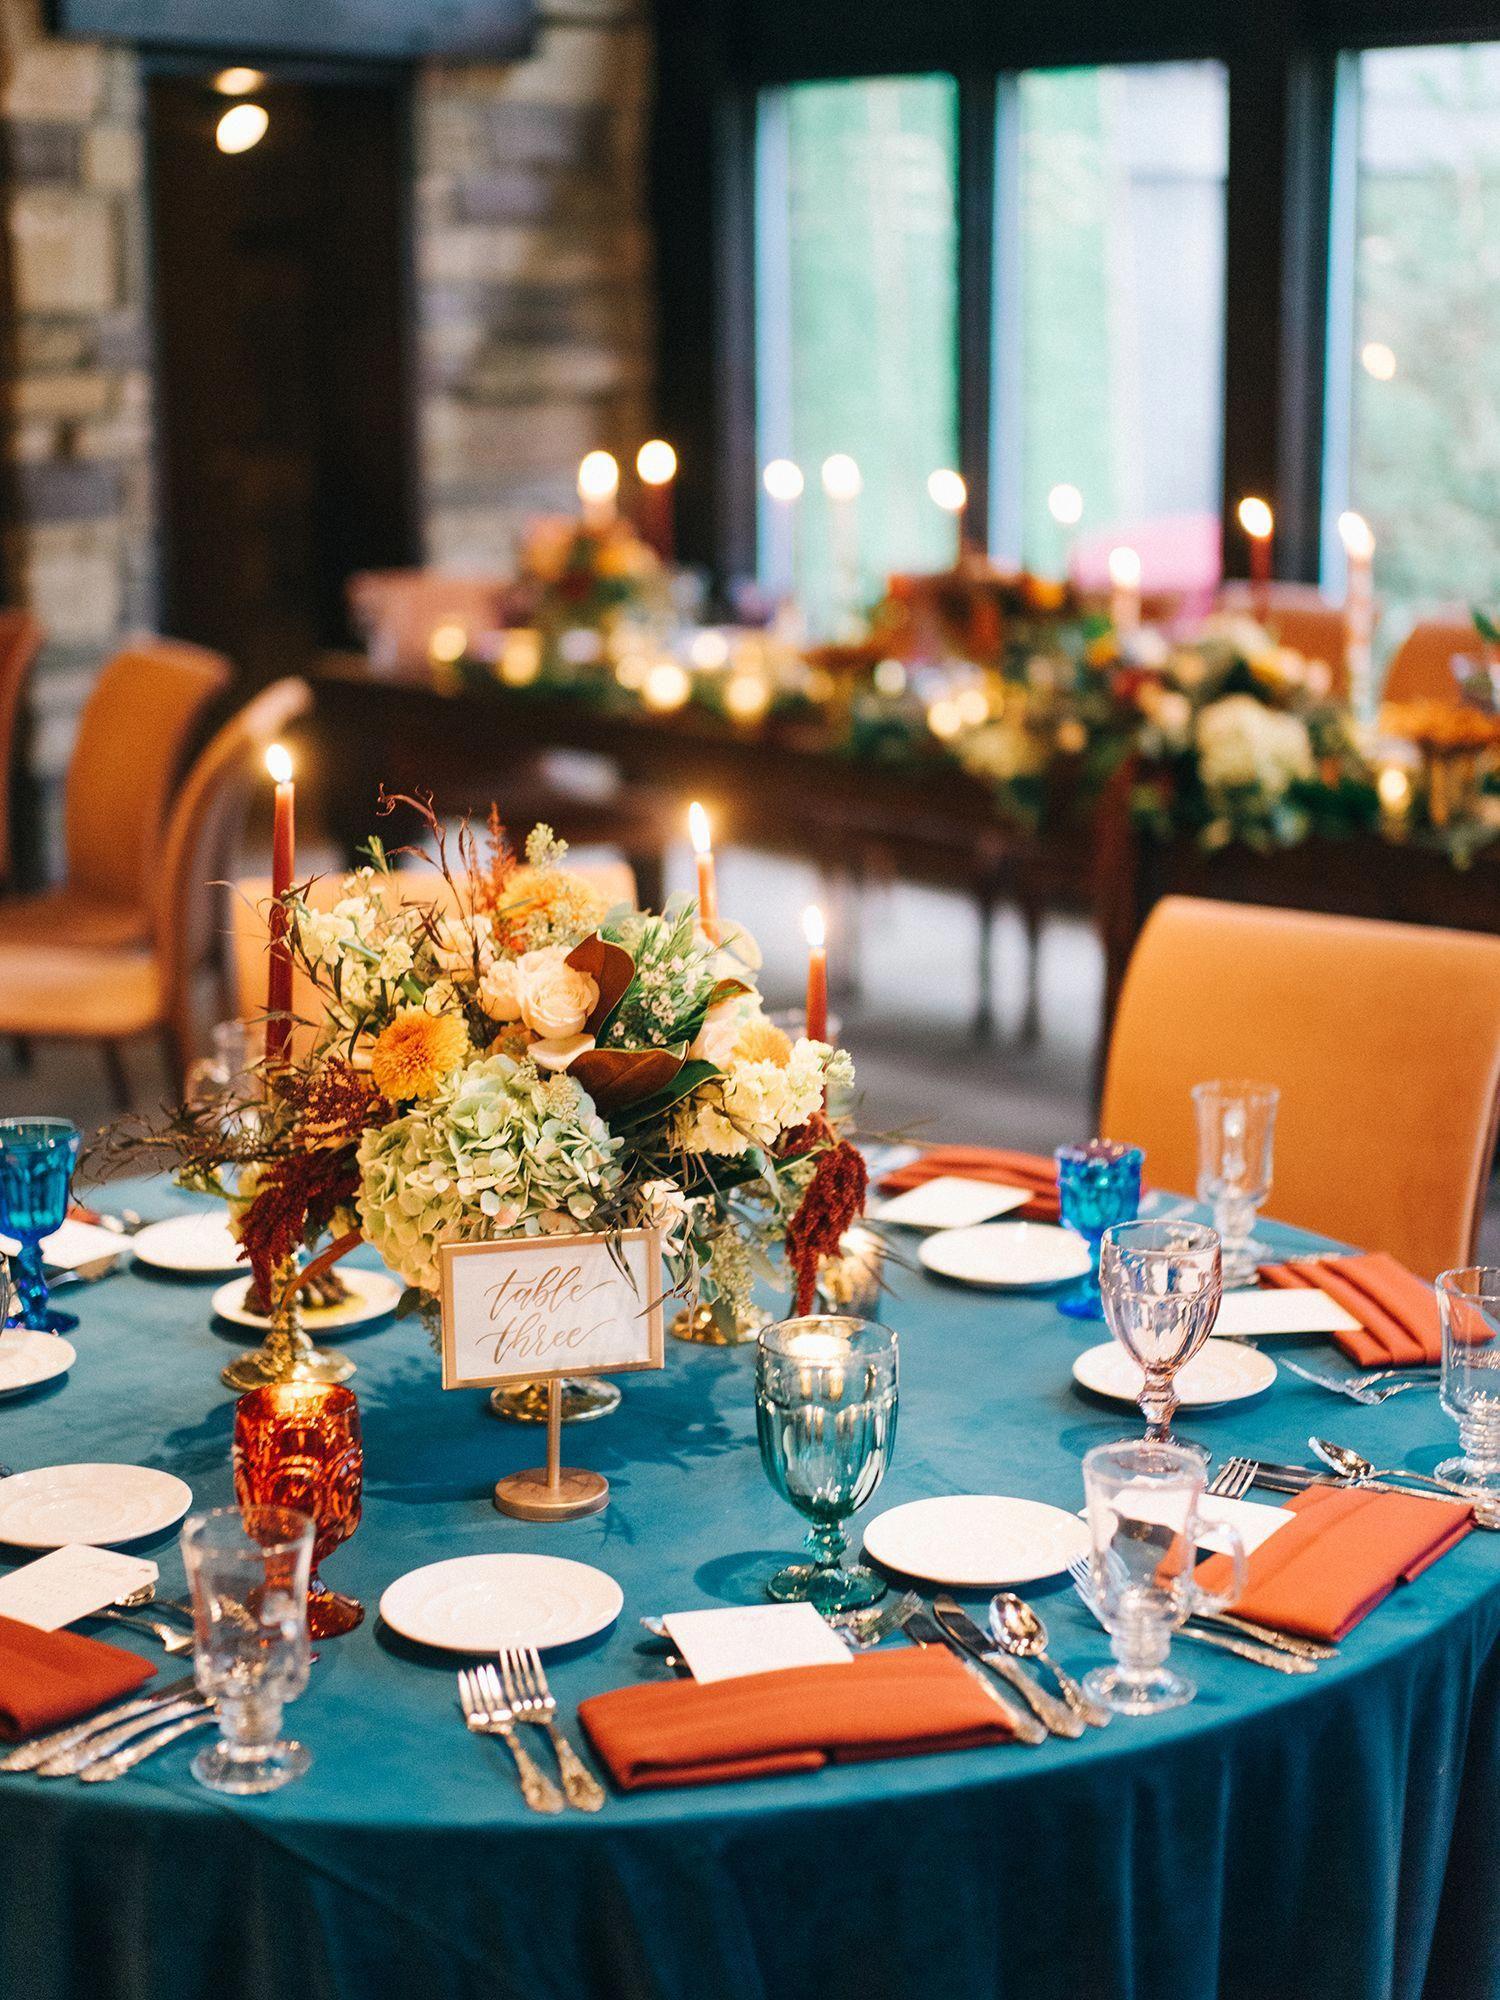 Teal Gold Orange Photography Sean Cook Weddings Autumnbedding